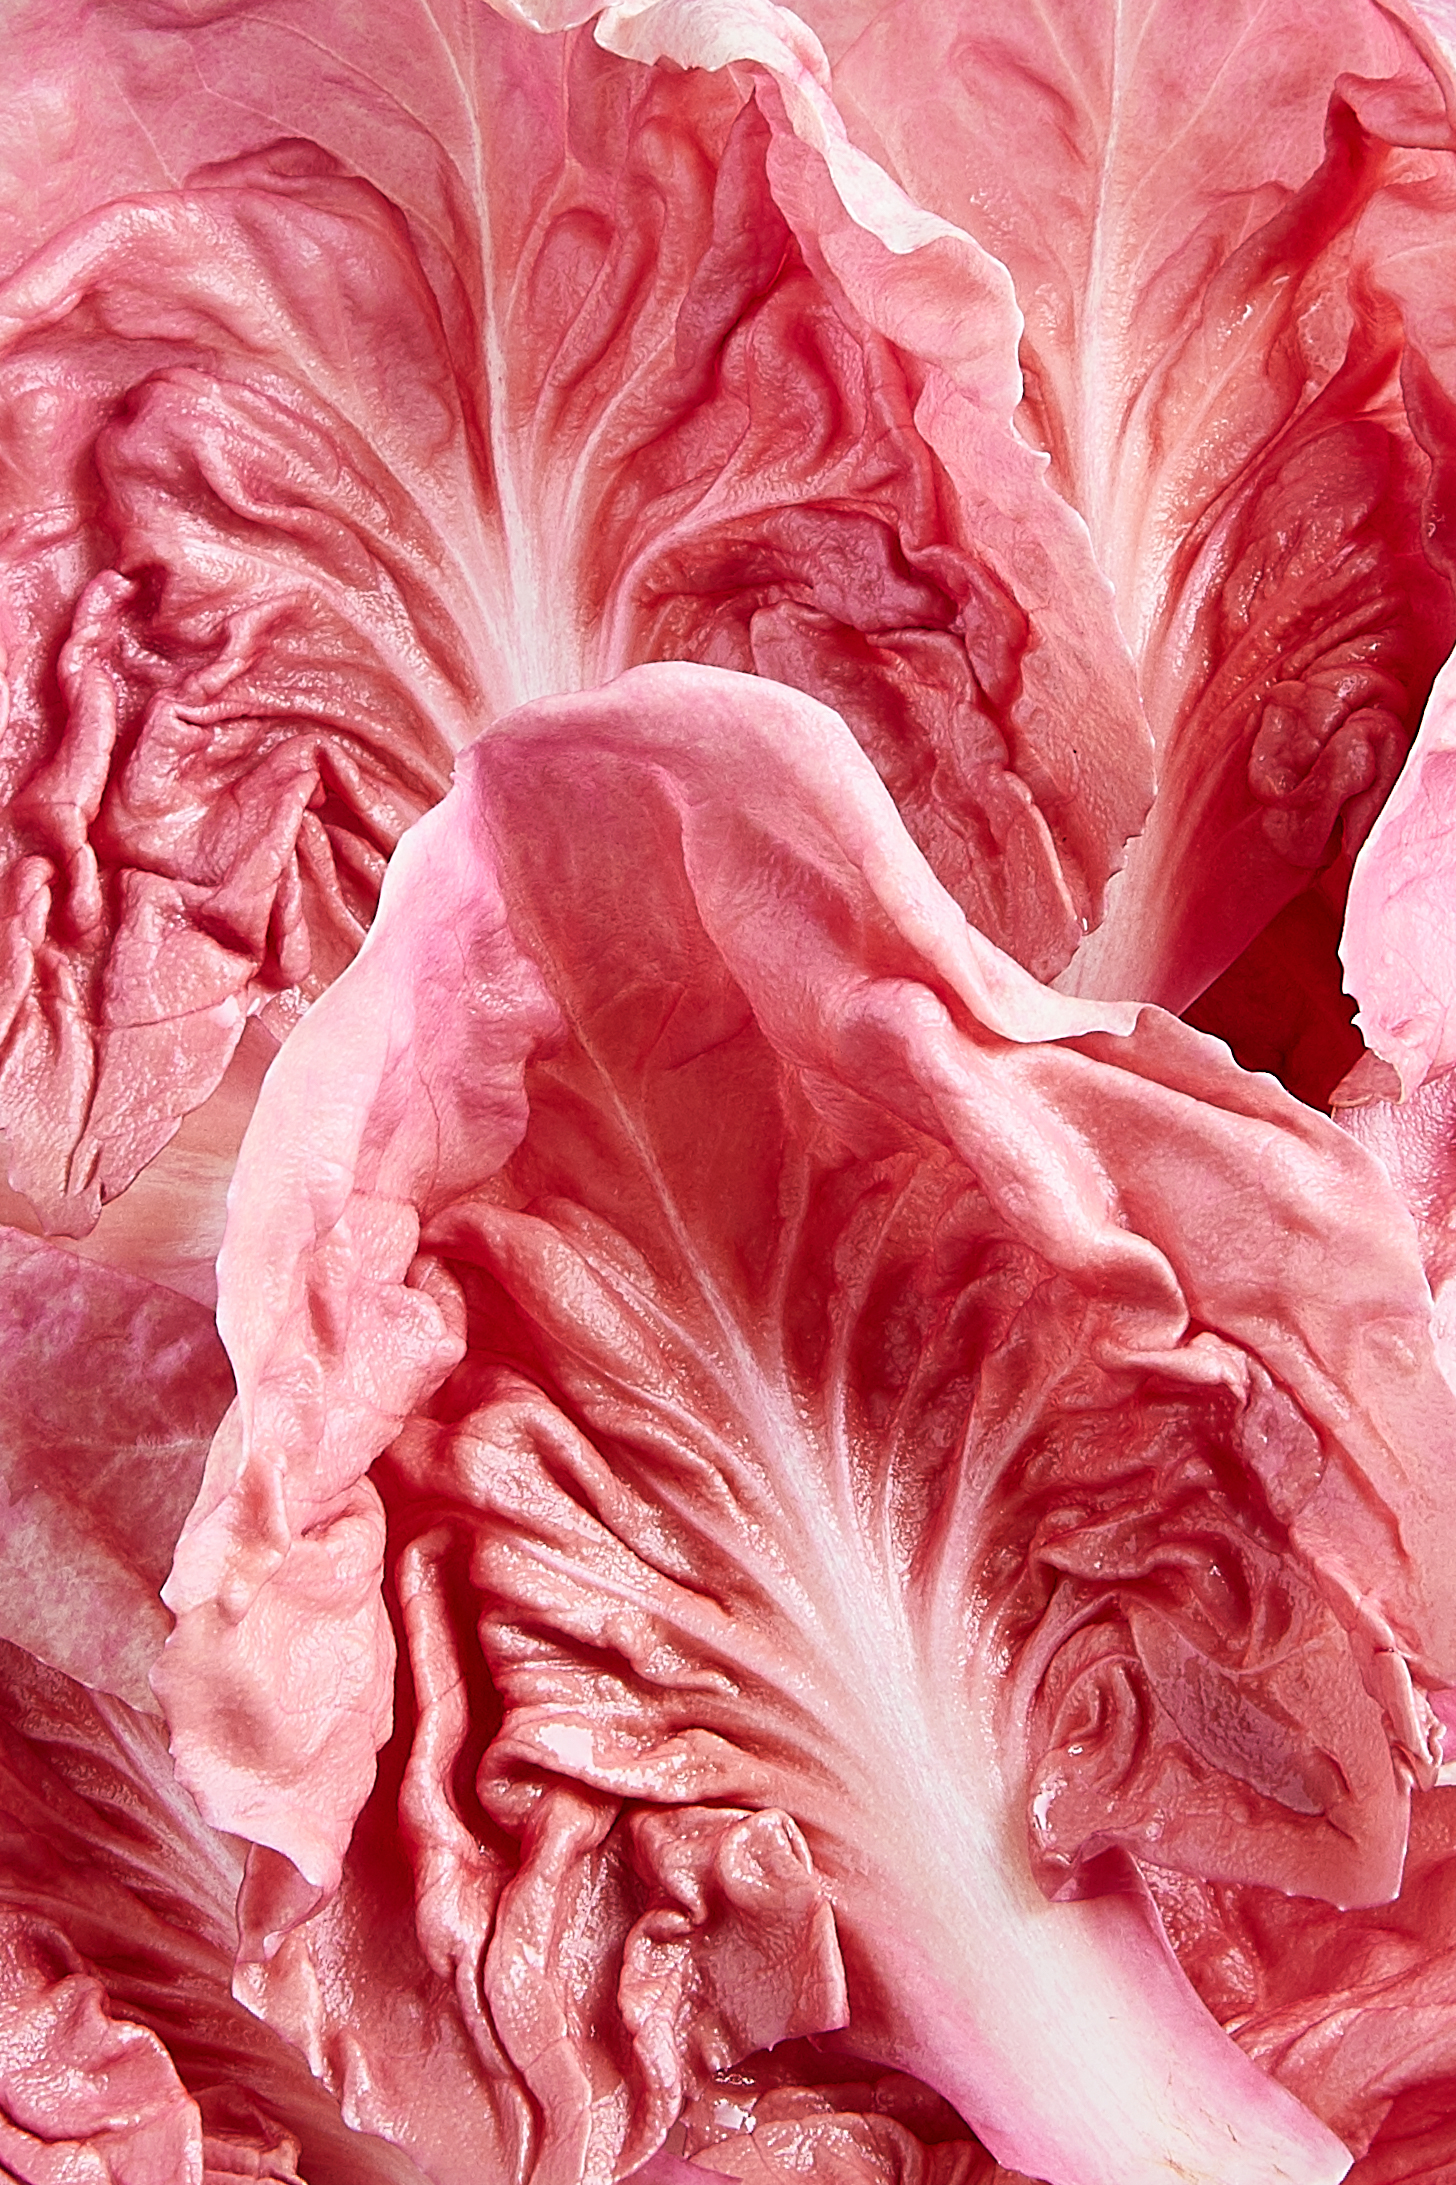 FoodMacros_GIFImages_TaraLiondaris 12.jpg